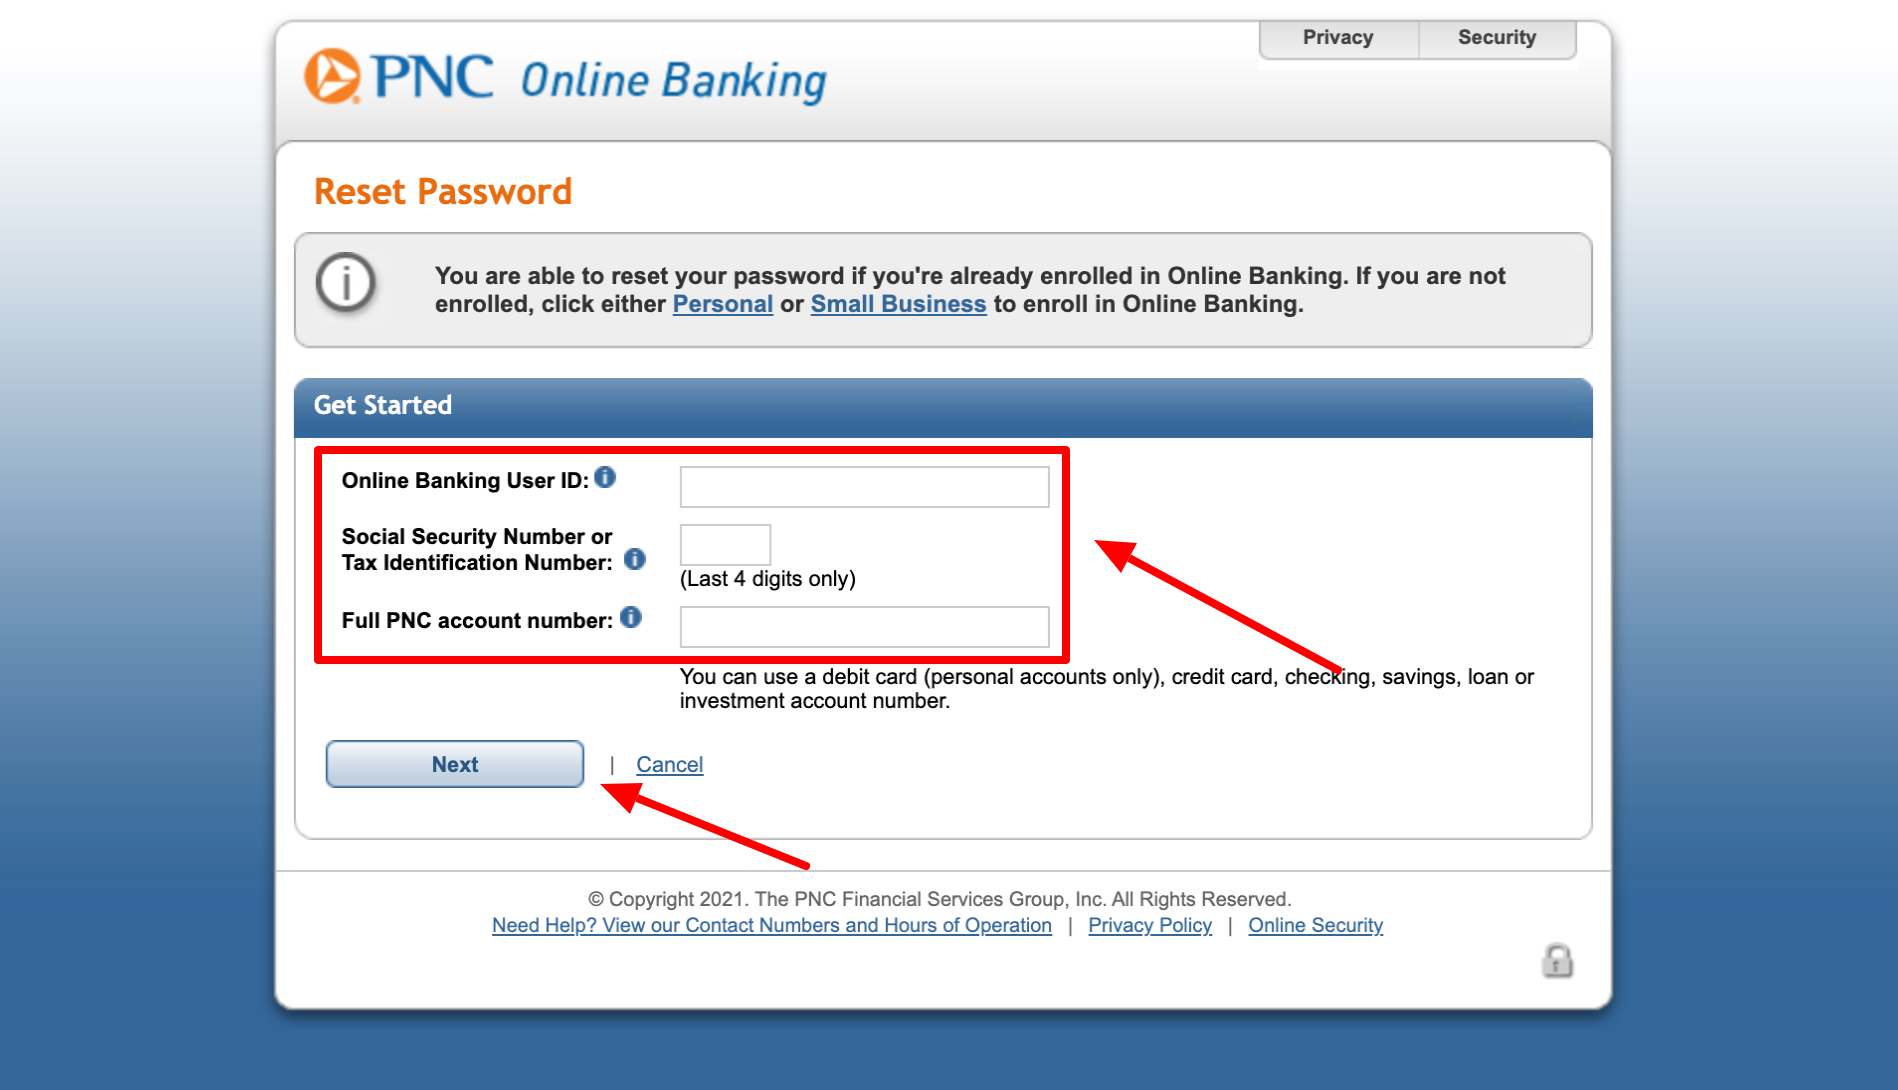 pnc online banking Reset Password